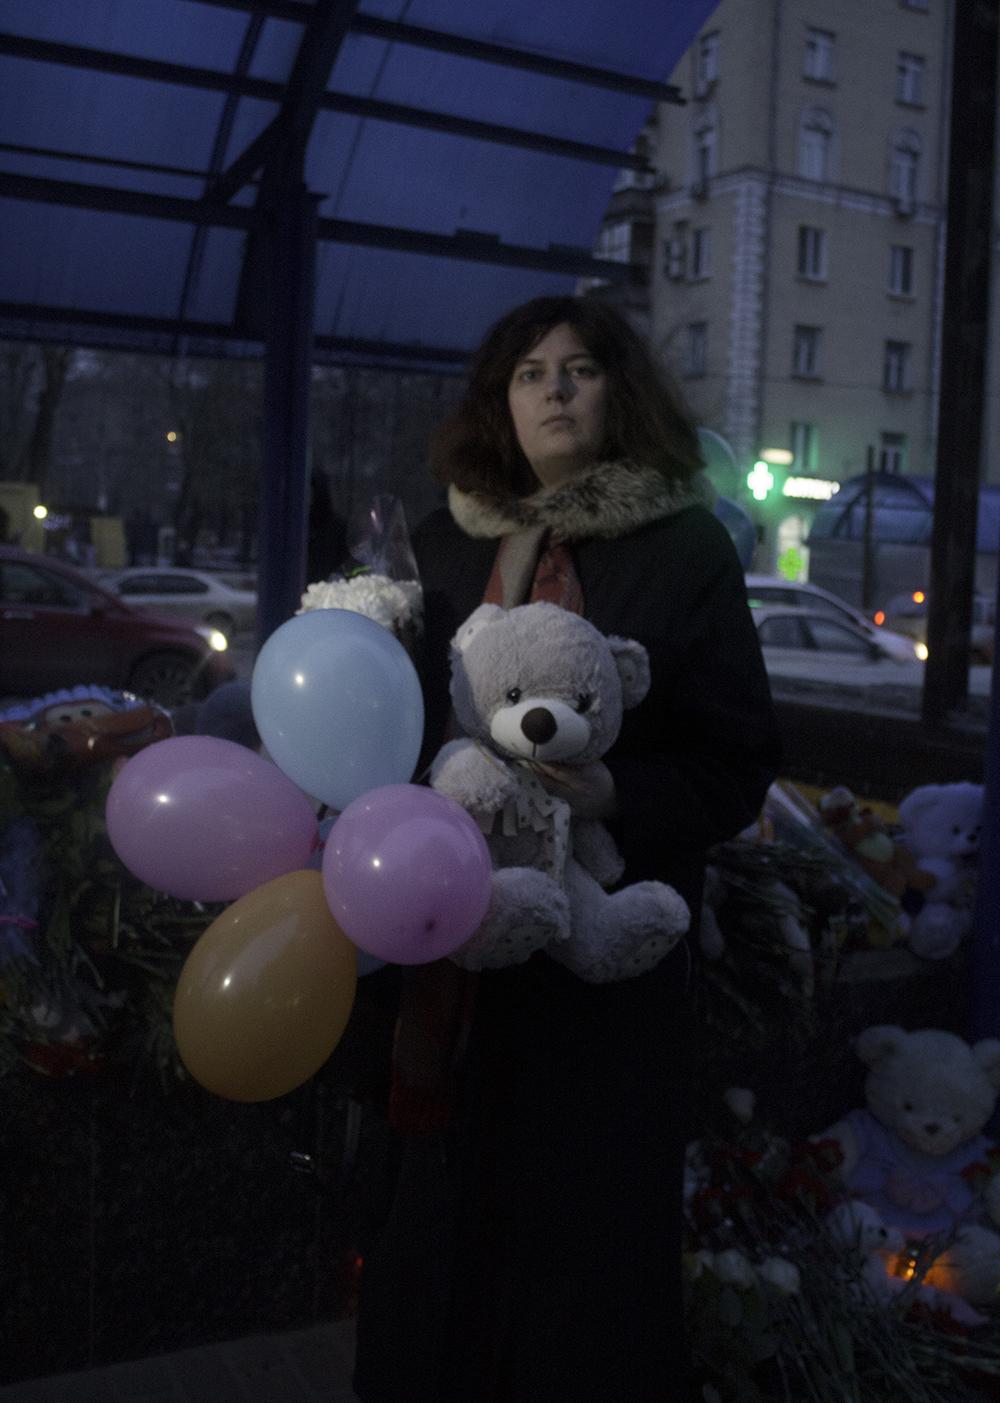 https://img-fotki.yandex.ru/get/67184/36058990.60/0_134bea_c06259b1_orig